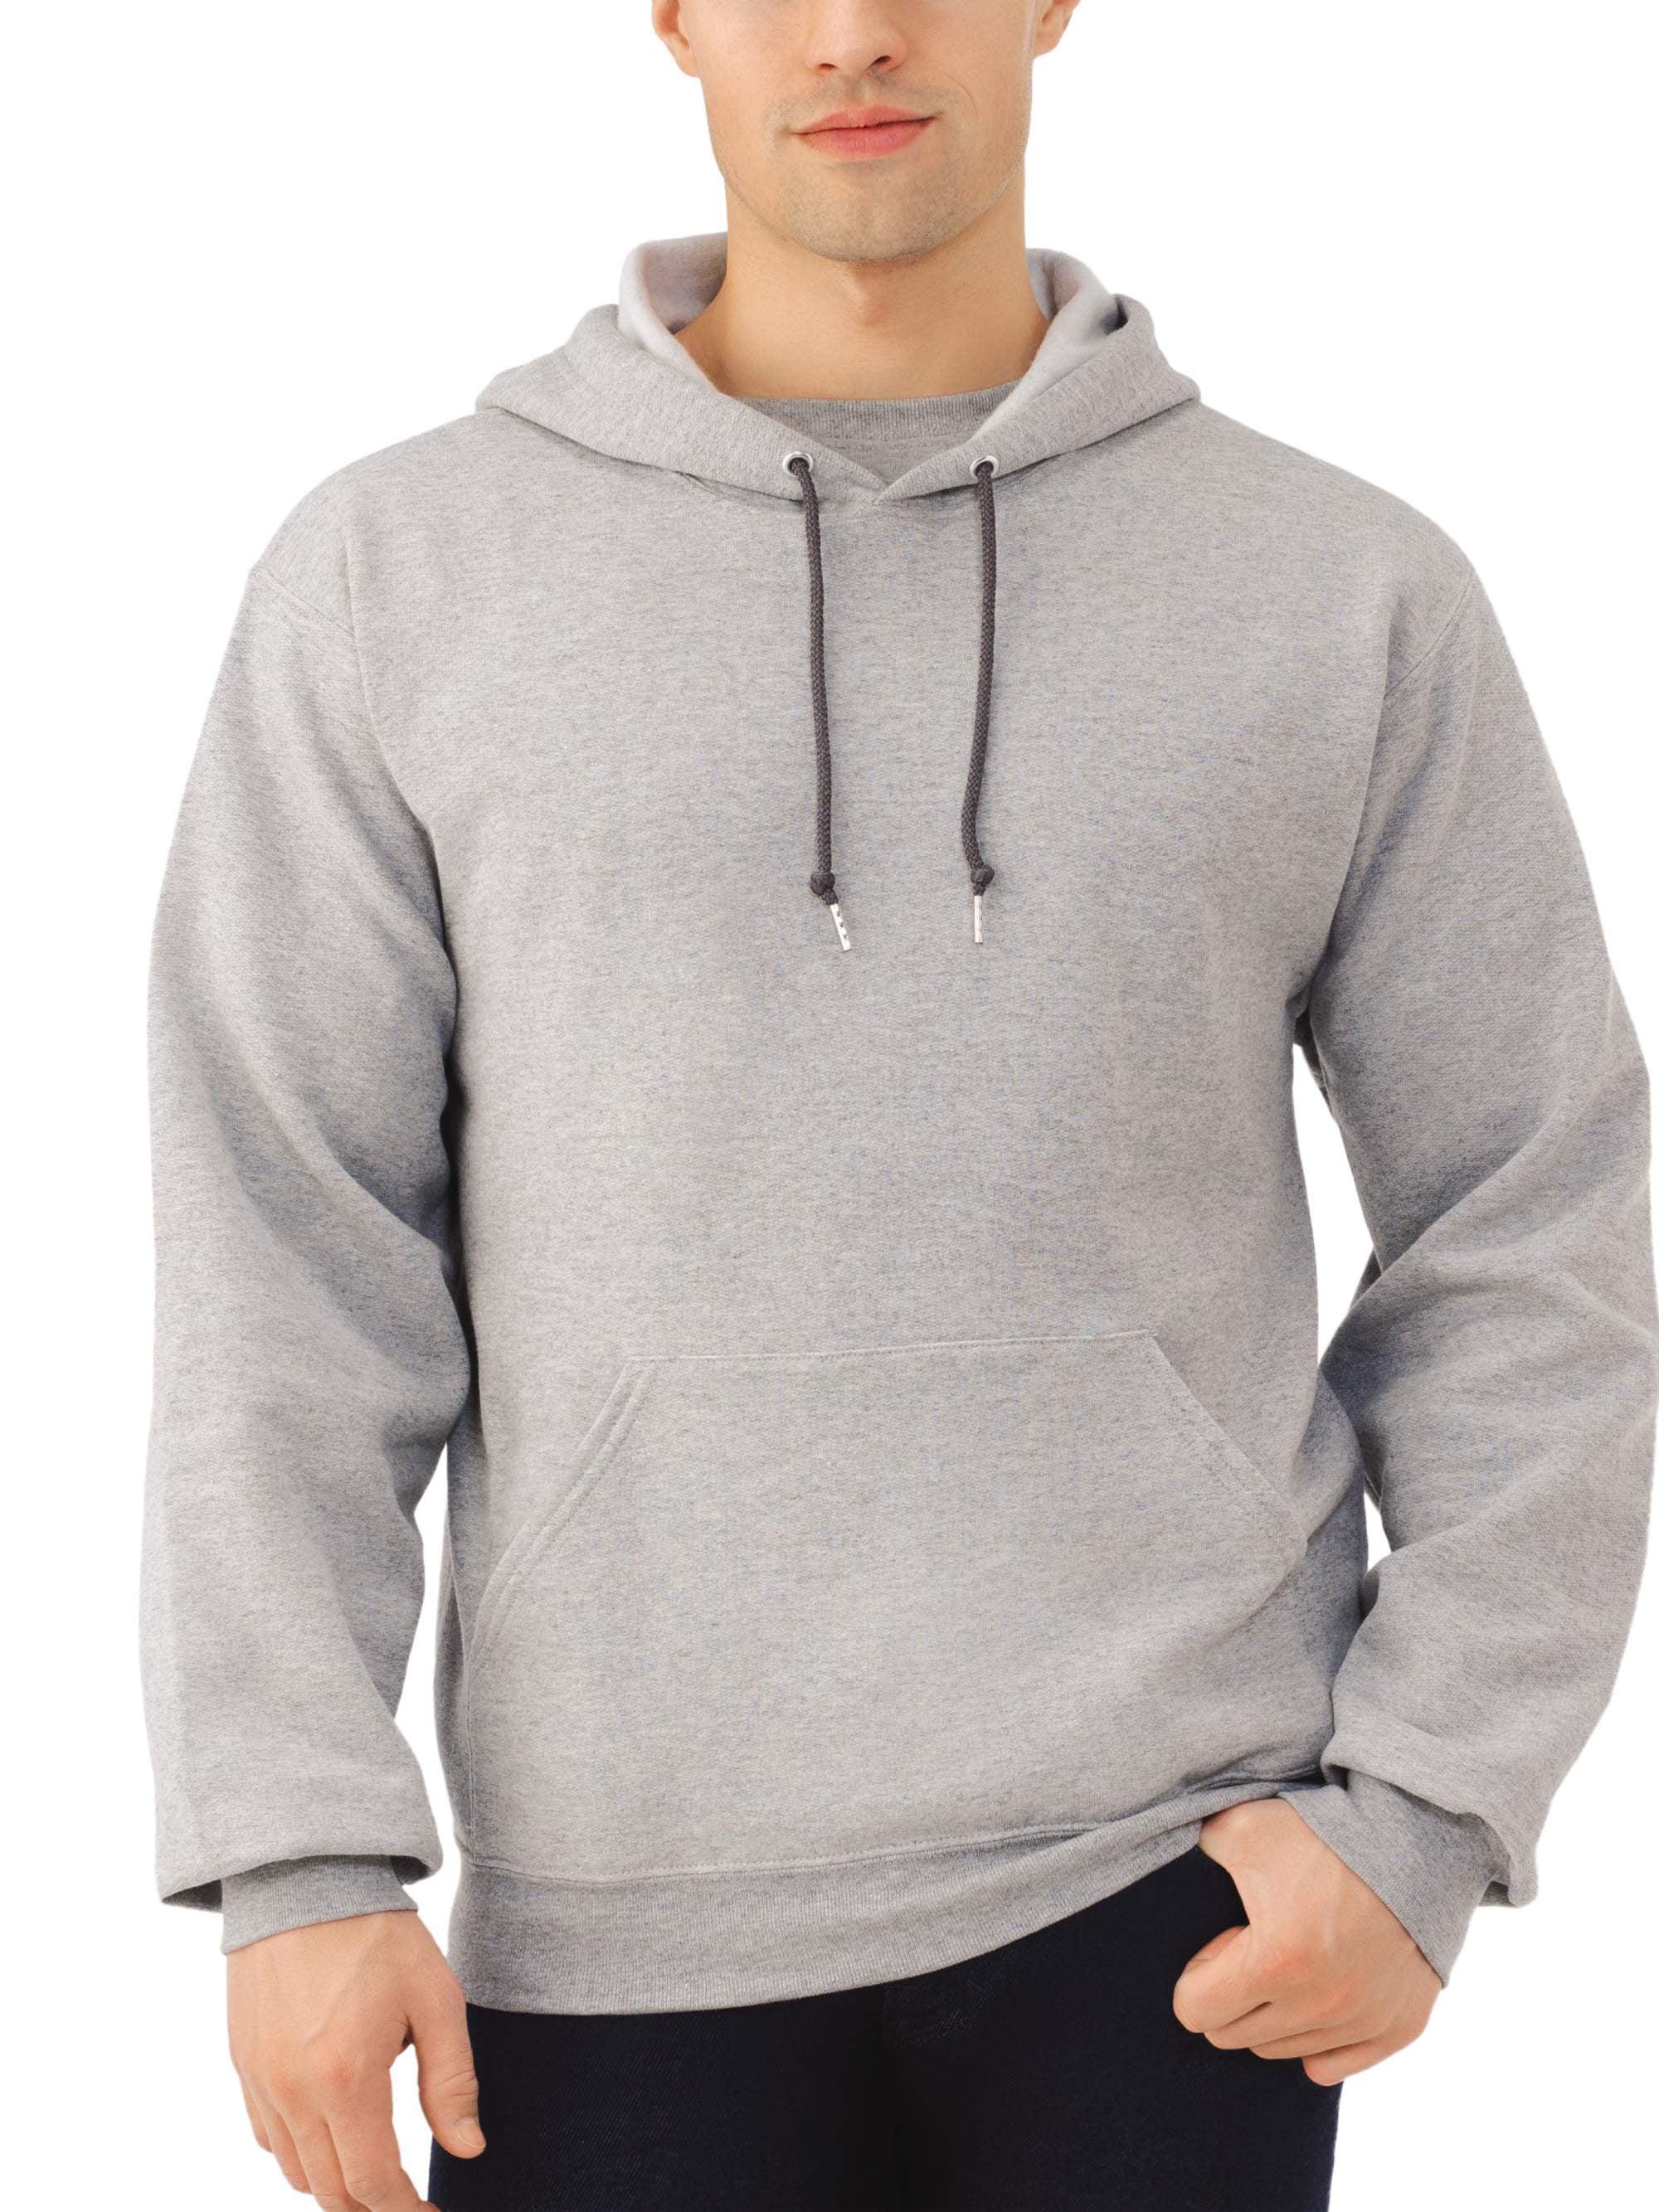 Fruit of the Loom Fruit of the Loom Men's and Big Men's Eversoft Fleece Pullover Hoodie Sweatshirt, up to Size 3XL